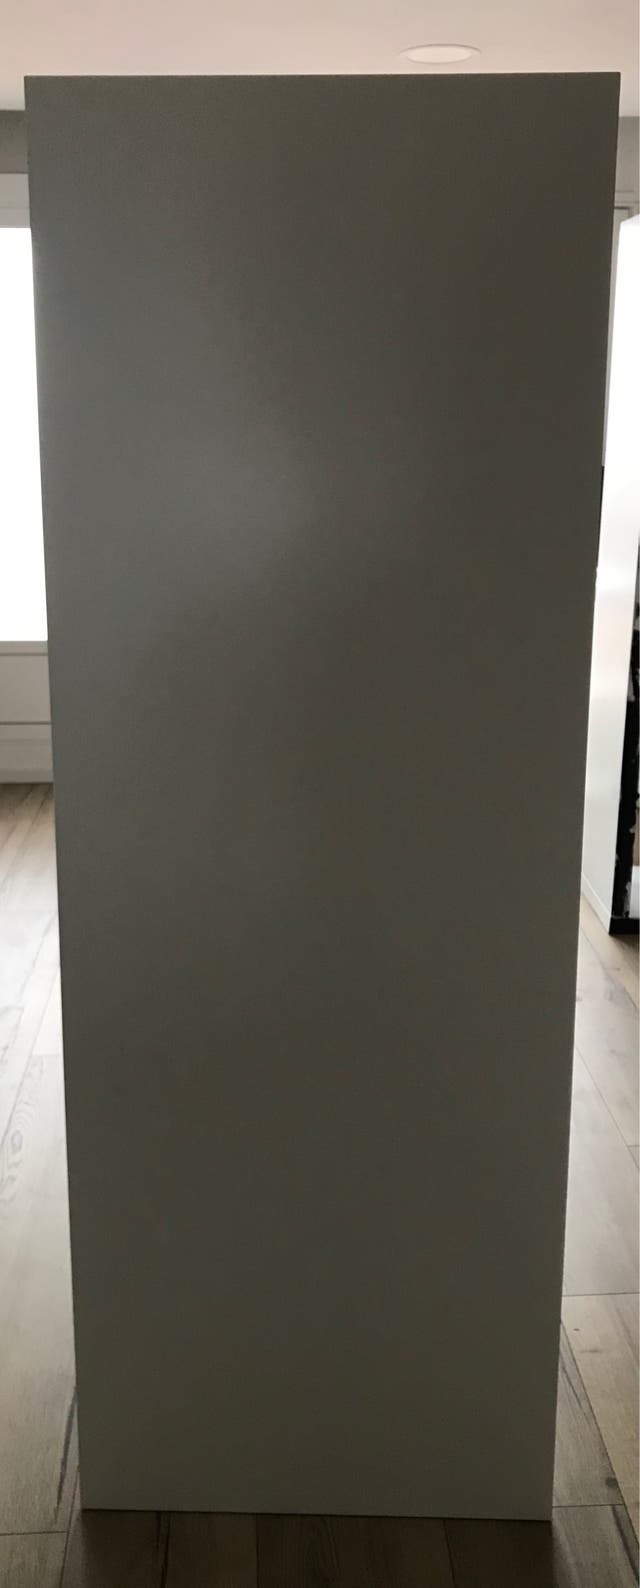 Cabecera cama Ikea